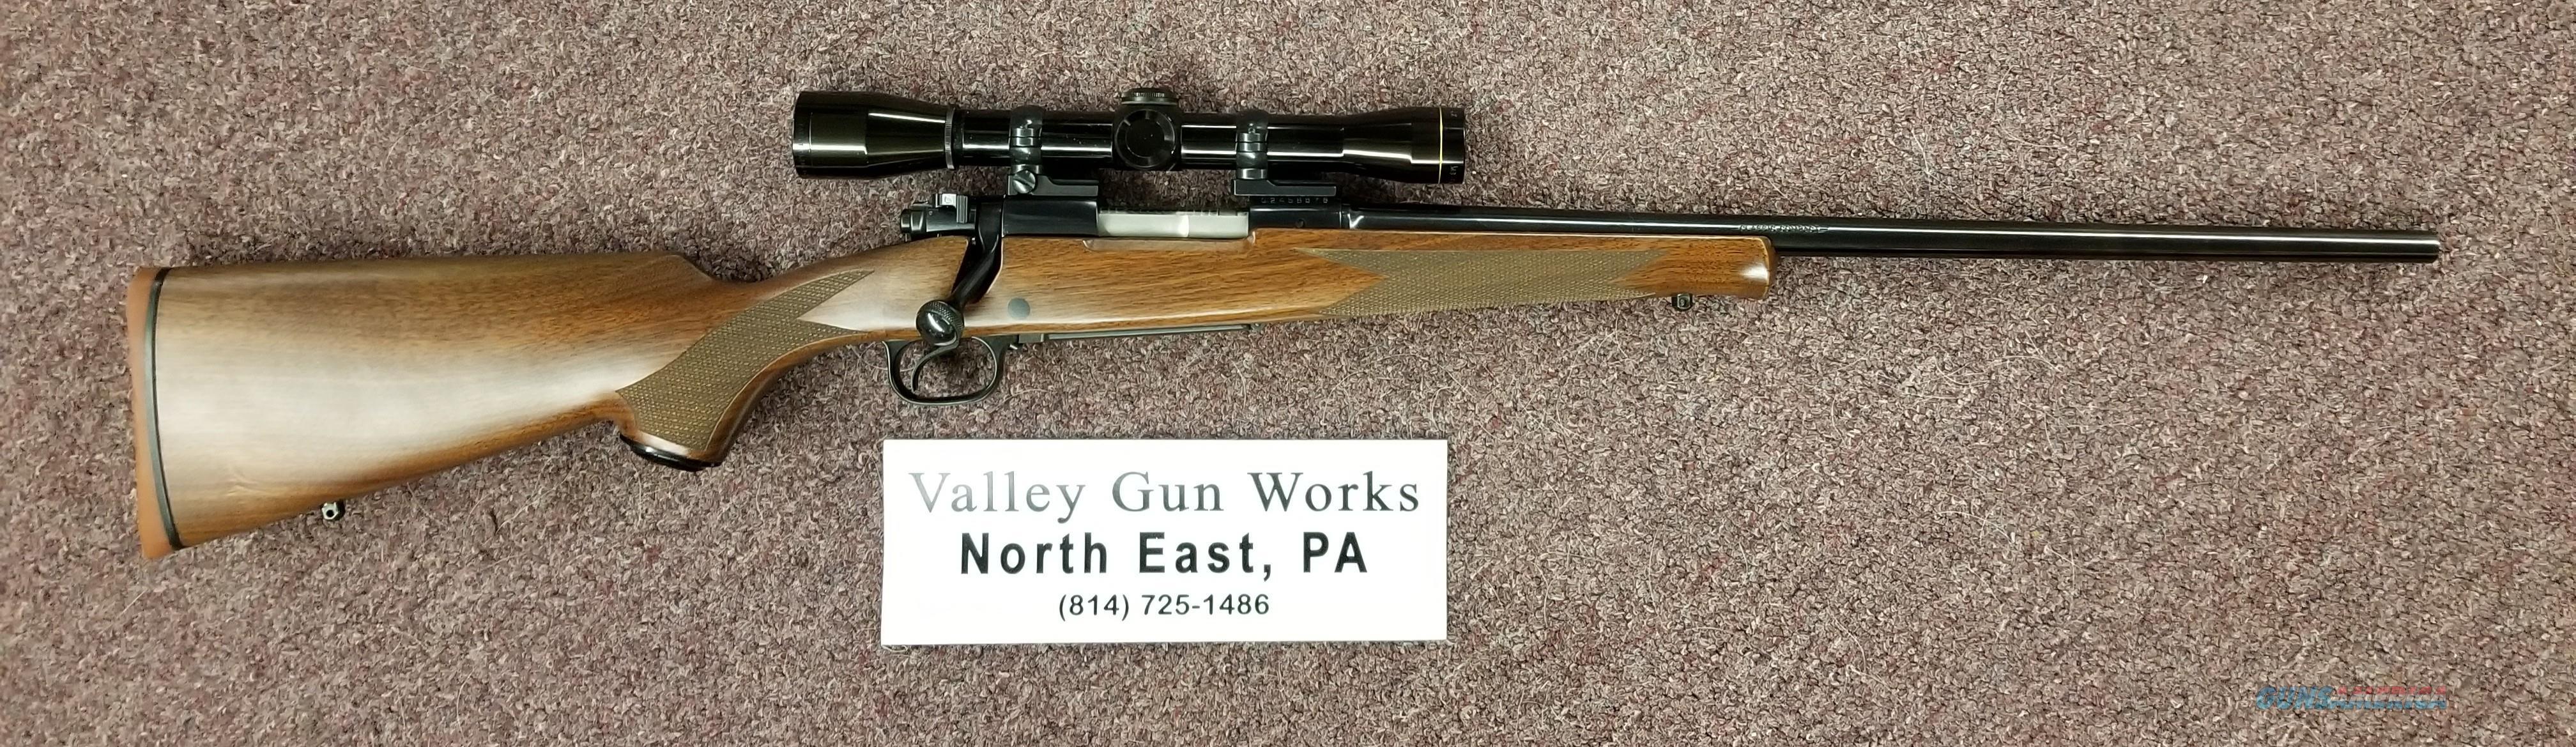 Winchester Model 70 - Classic Compact .243 - Leupold Optics - Free Shipping  Guns > Rifles > Winchester Rifles - Modern Bolt/Auto/Single > Model 70 > Post-64